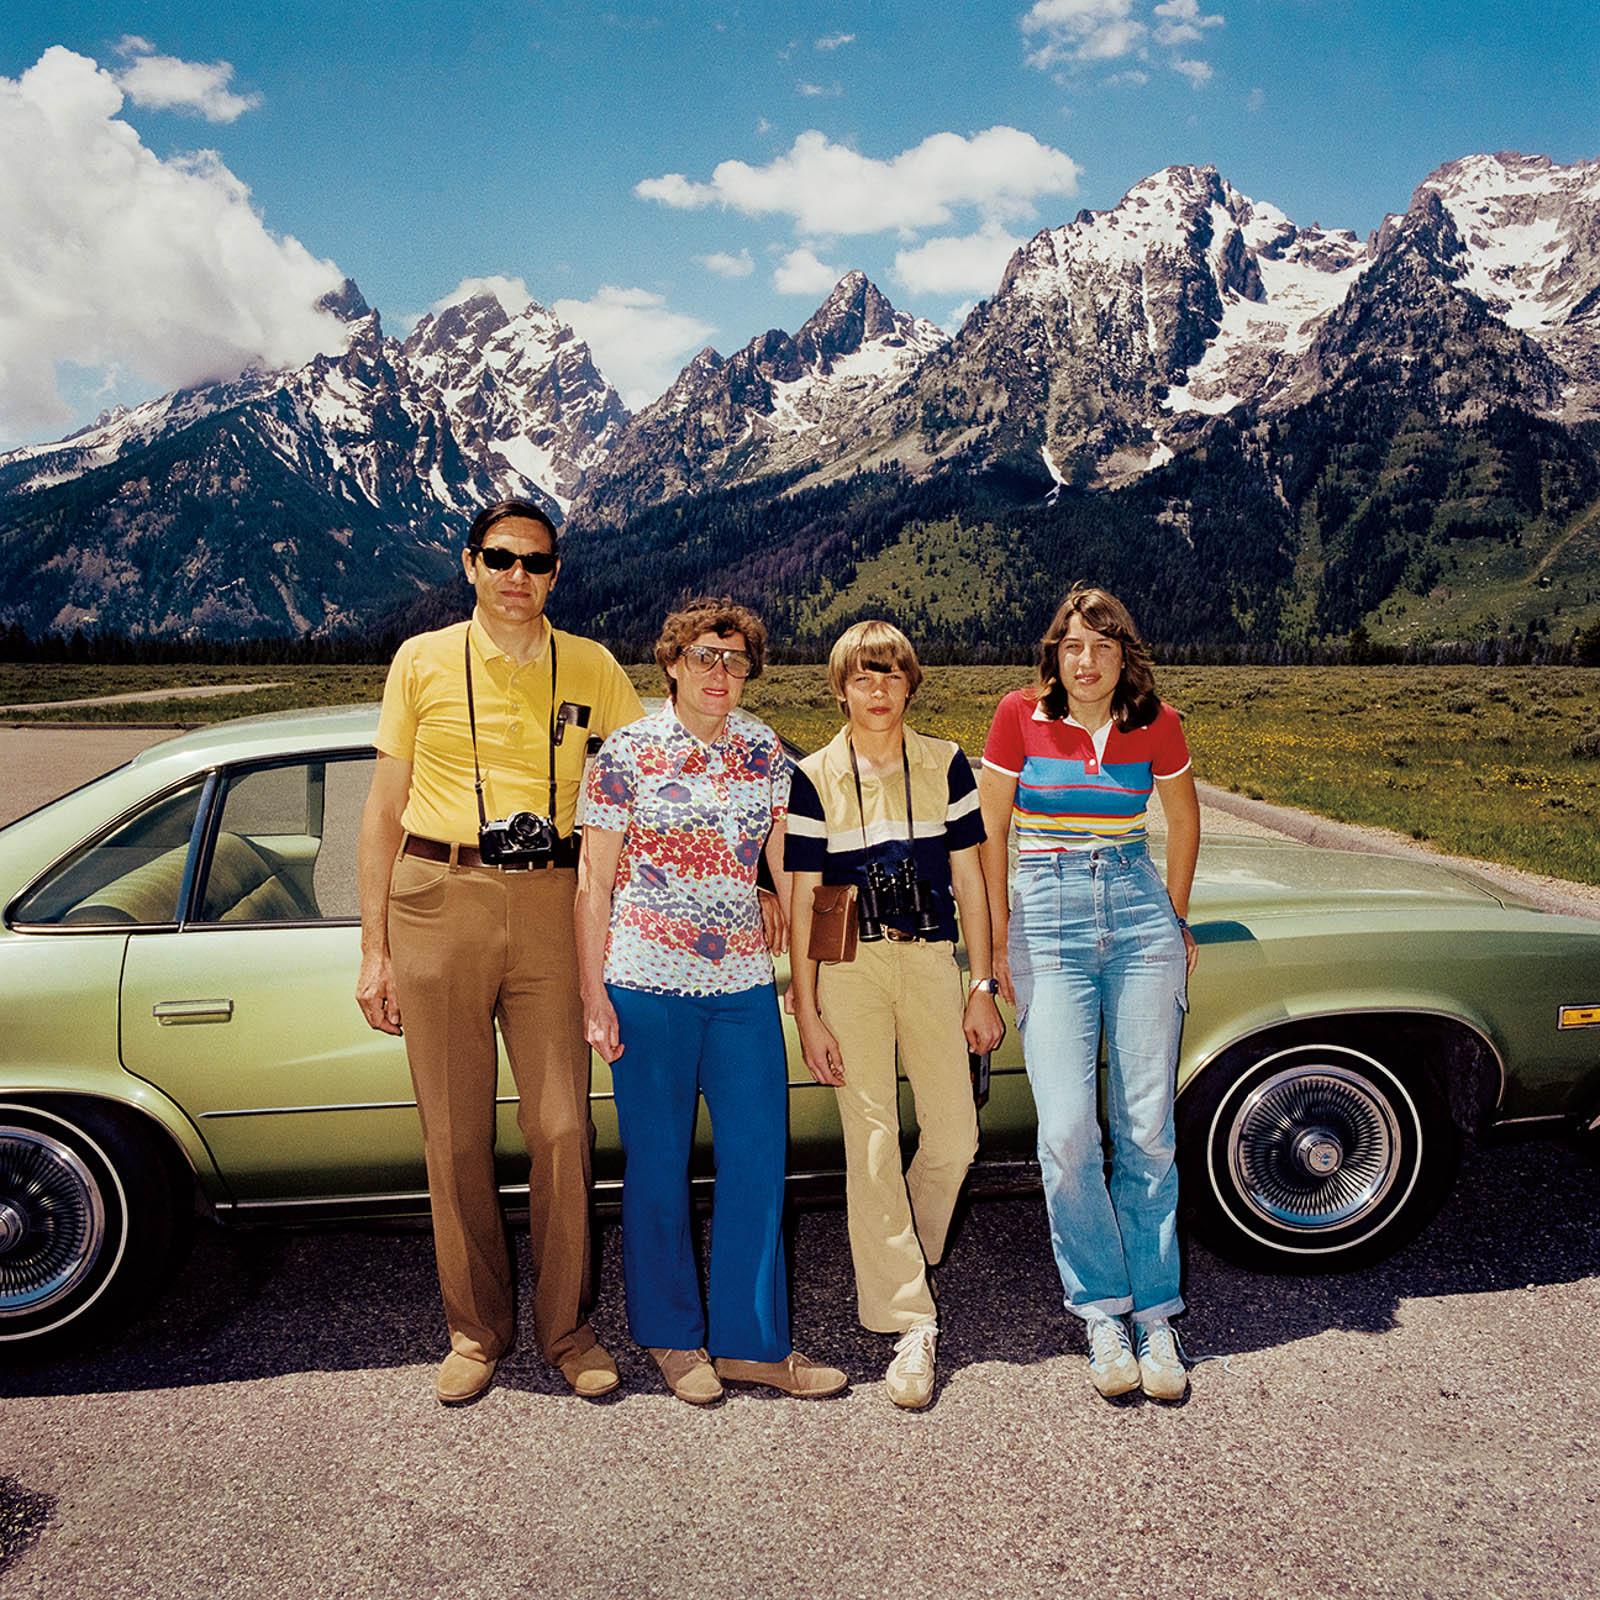 Family at Grand Tetons National Park, Wyoming 1980